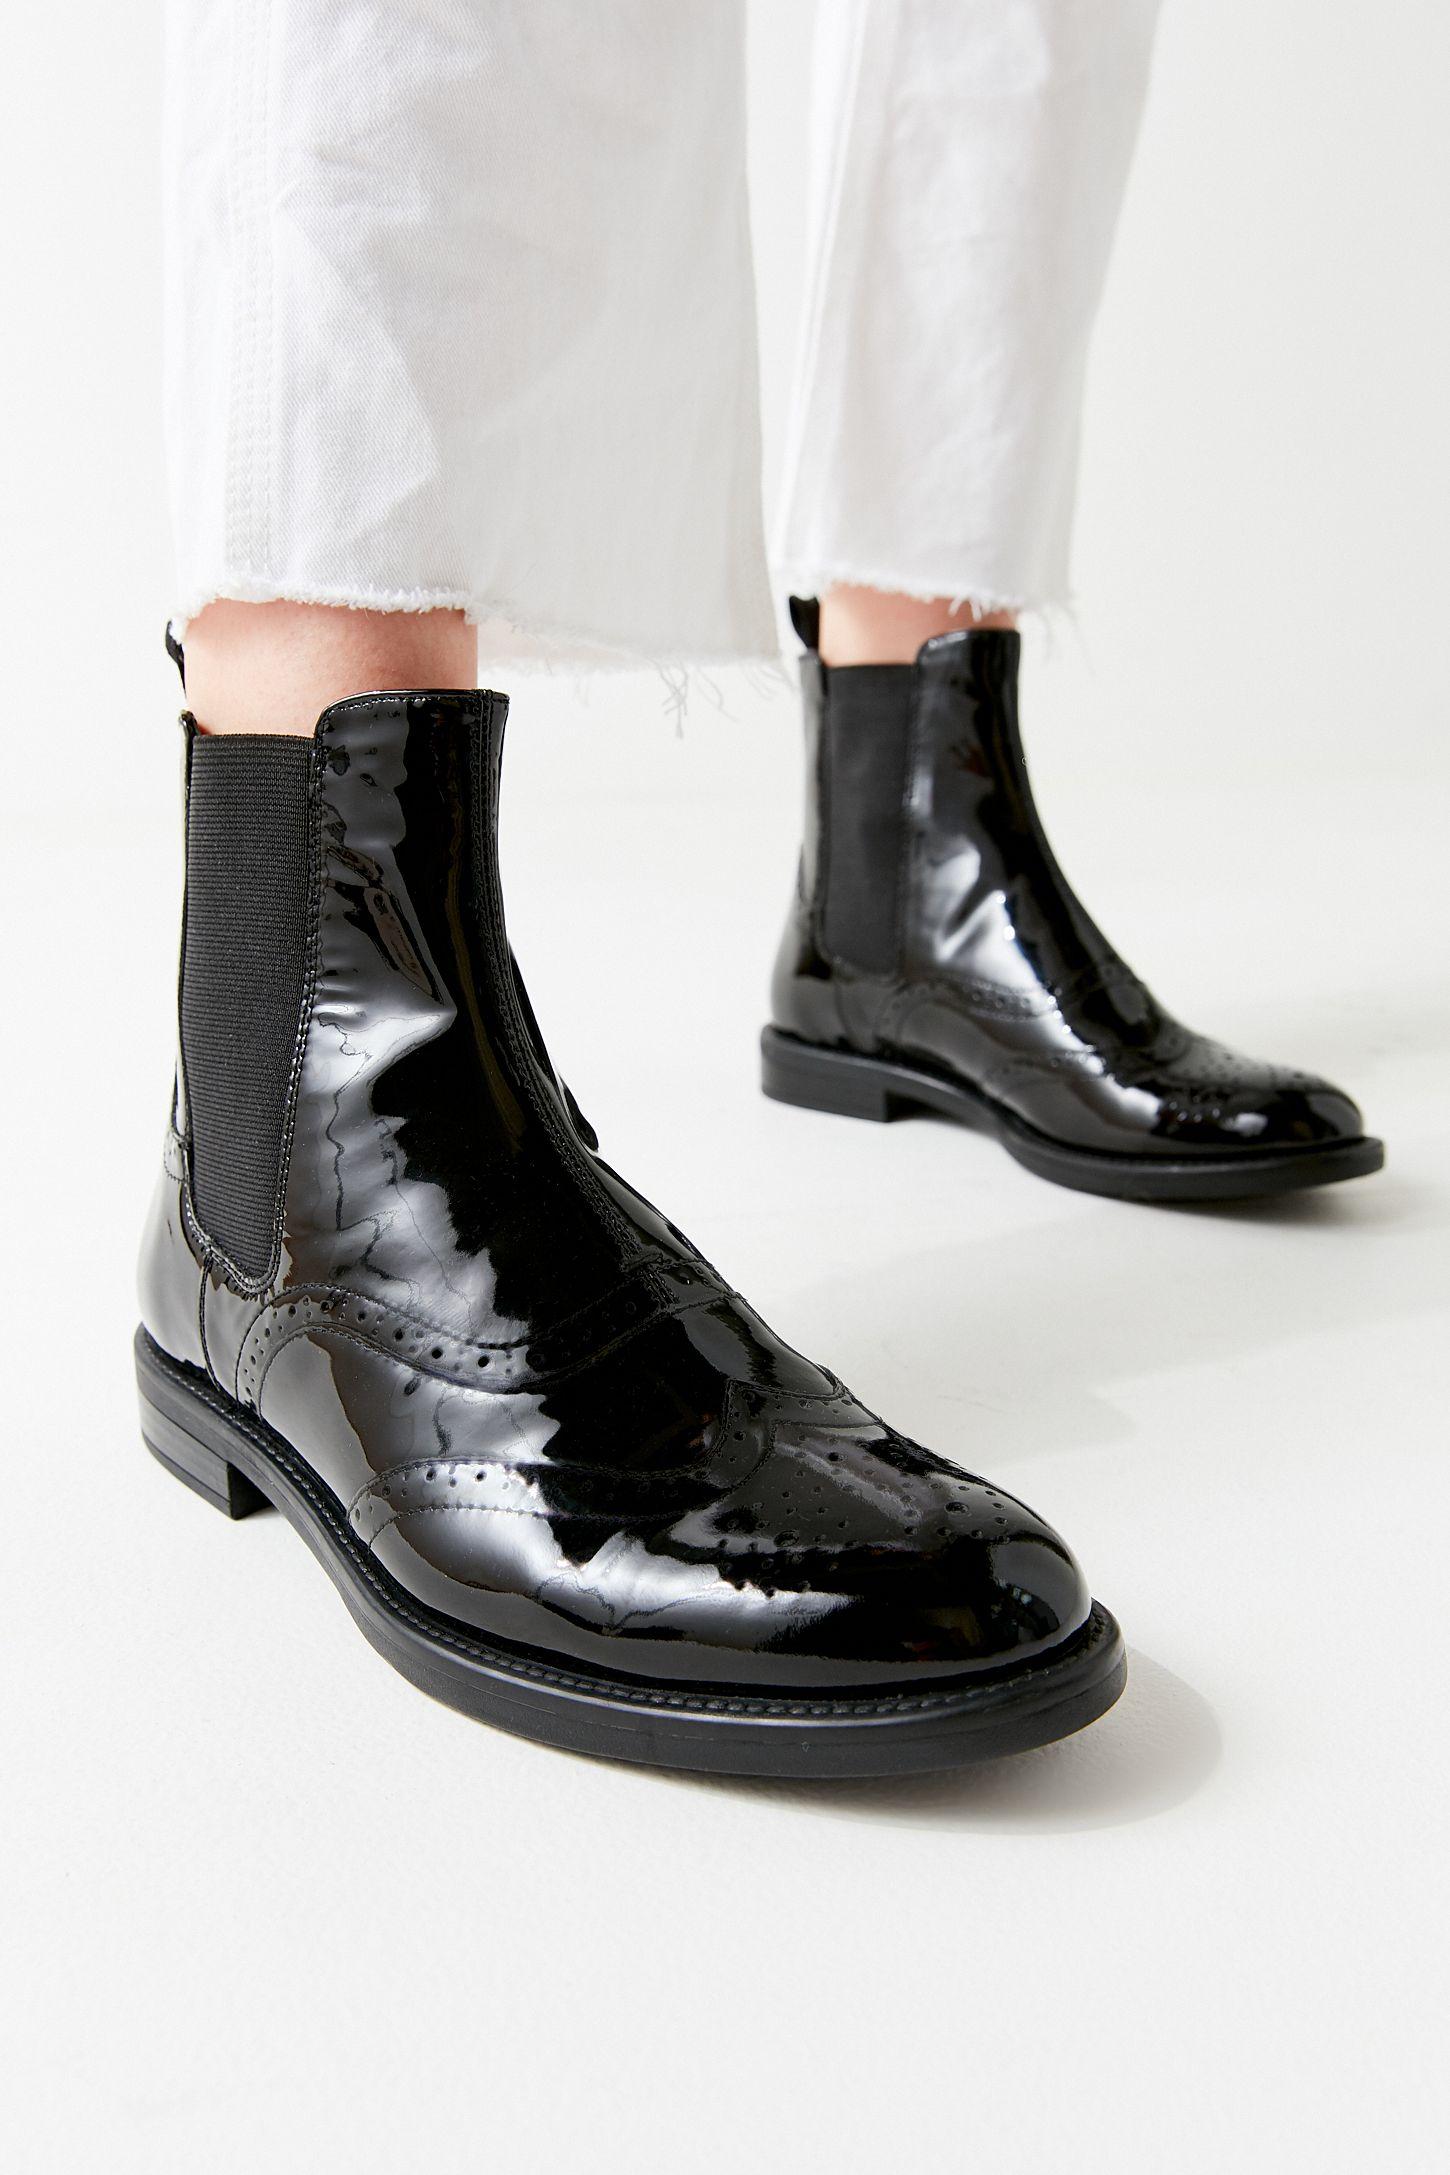 Vagabond Shoemakers AMINA 3 @